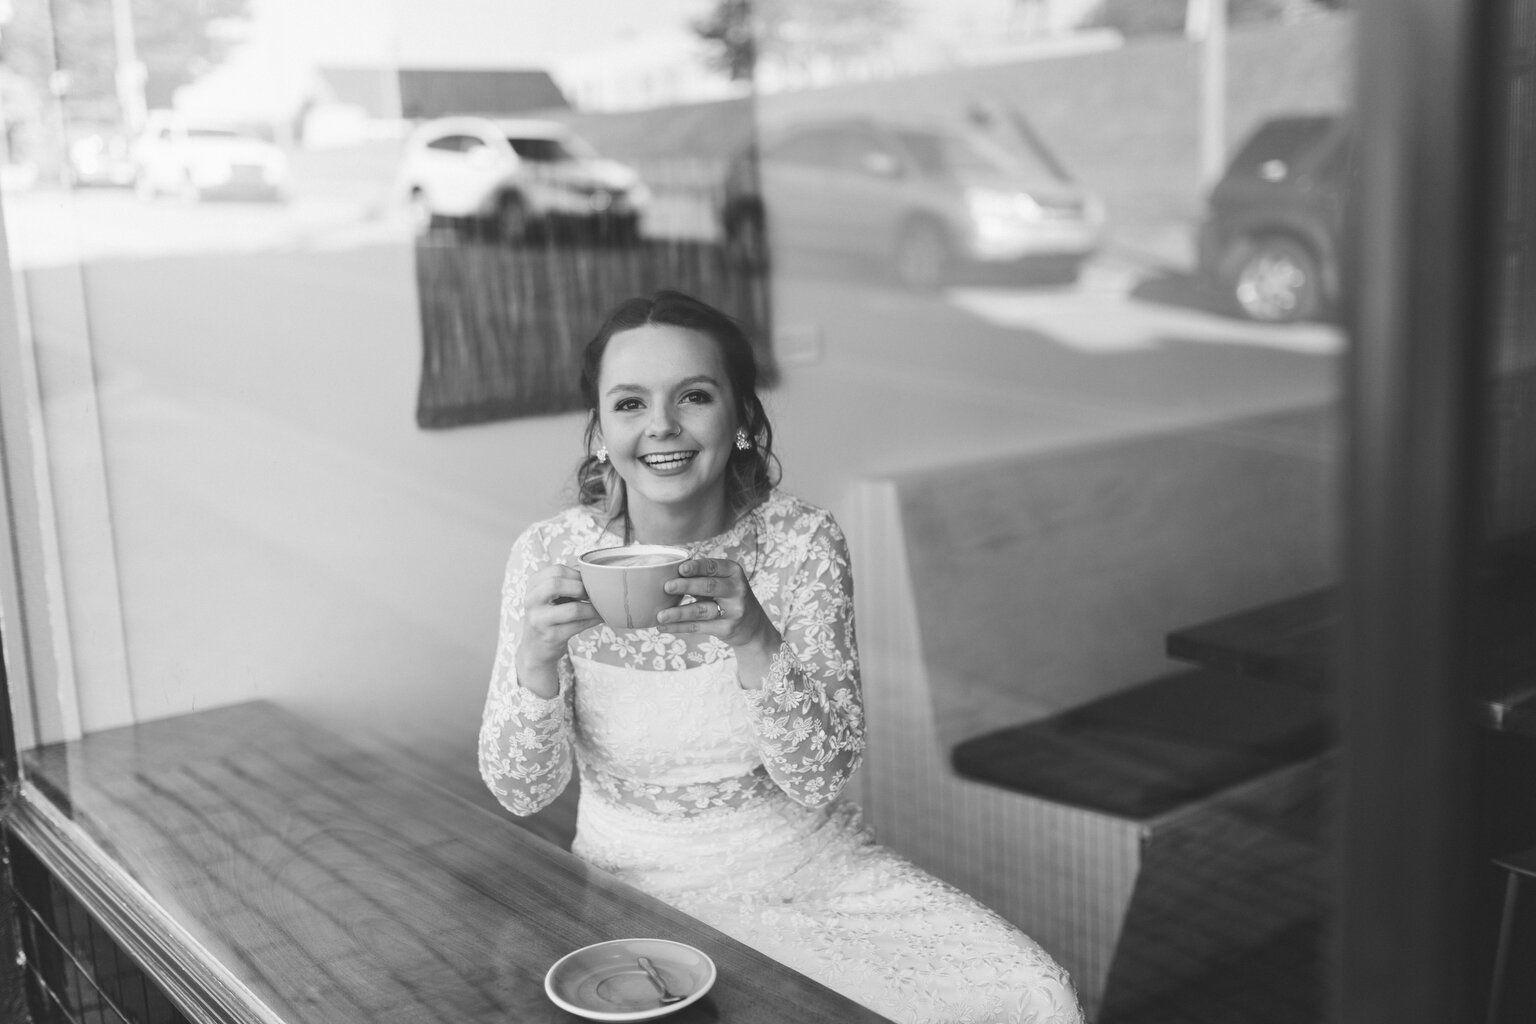 Bridal Portraits Boho Bride At Coffee Shop Waynesville Nc Wedding Photographer In 2020 Boho Bride Two Piece Wedding Dress Bride